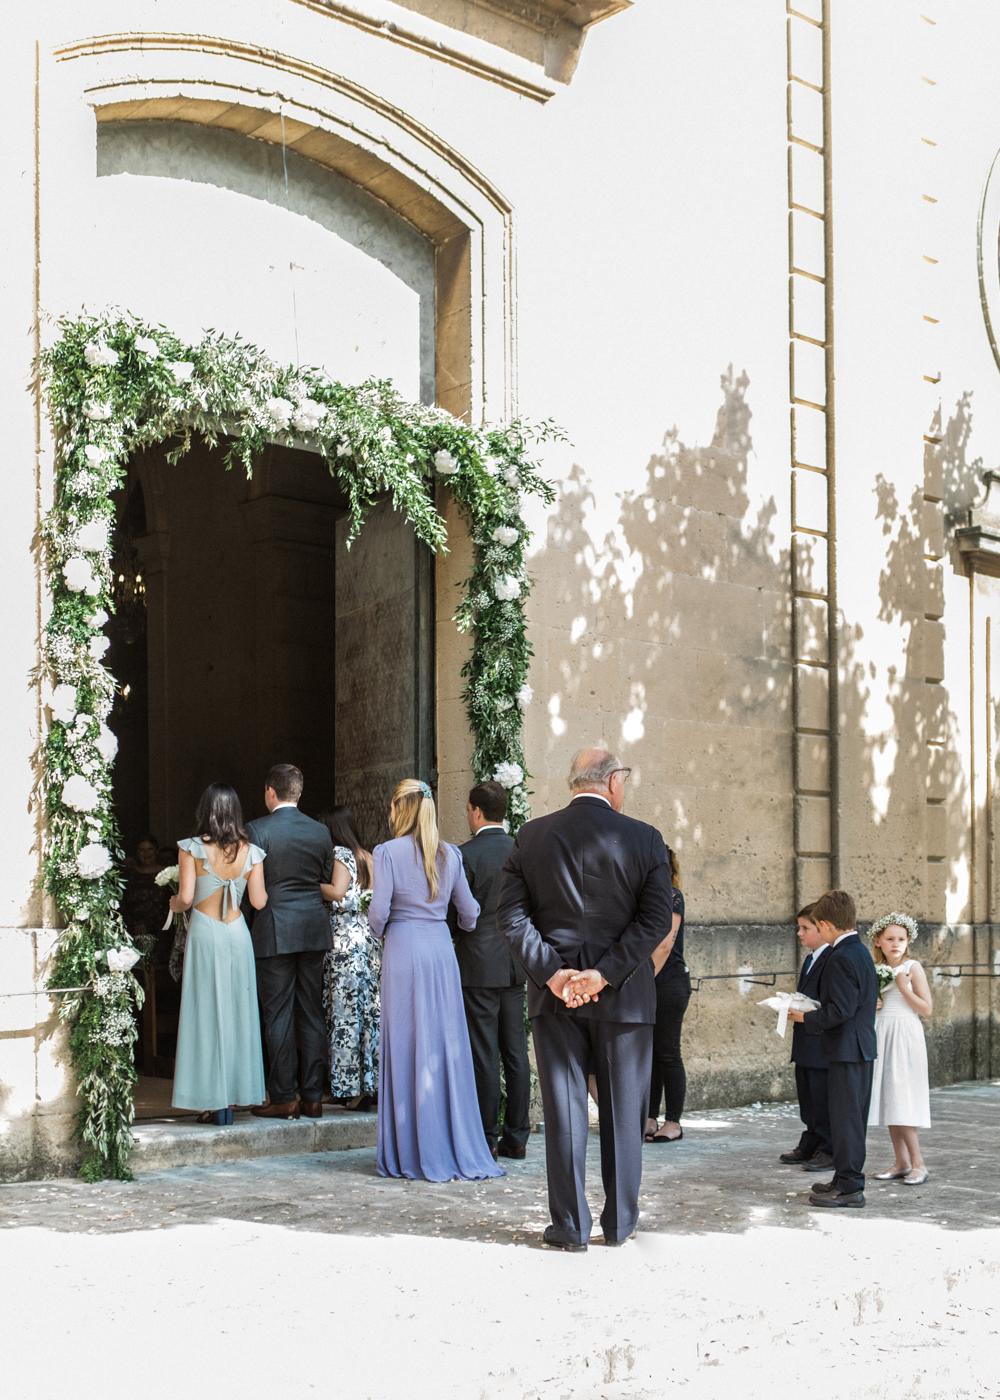 Provence_Wedding_(c)_Rory_Wylie-74.jpg